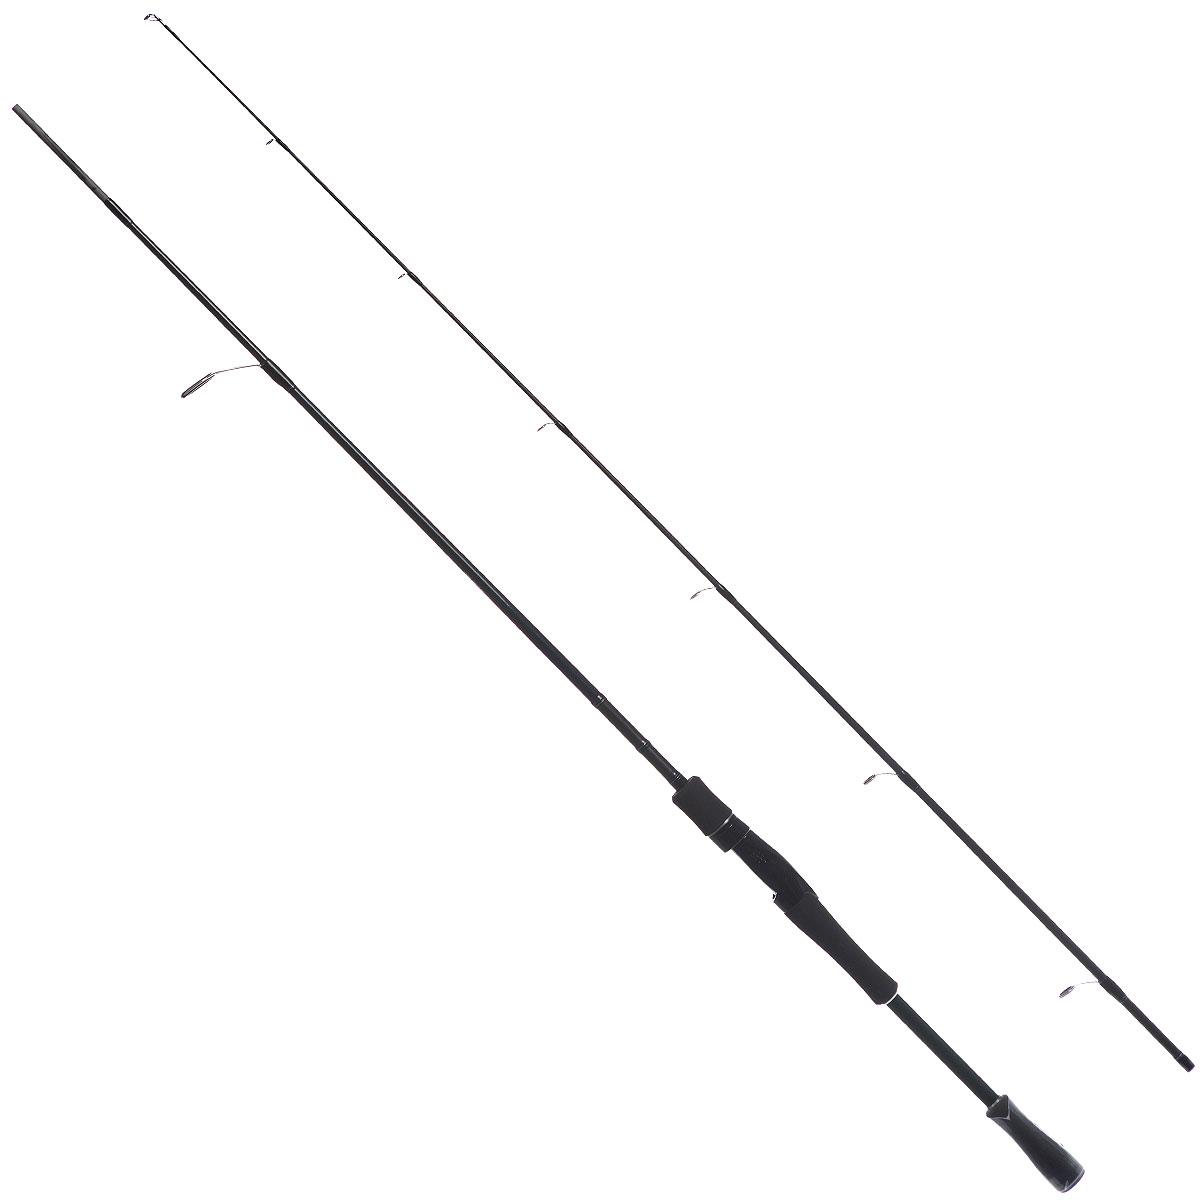 Спиннинг штекерный Daiwa Power Mesh, 2,1 м, 7-28 г